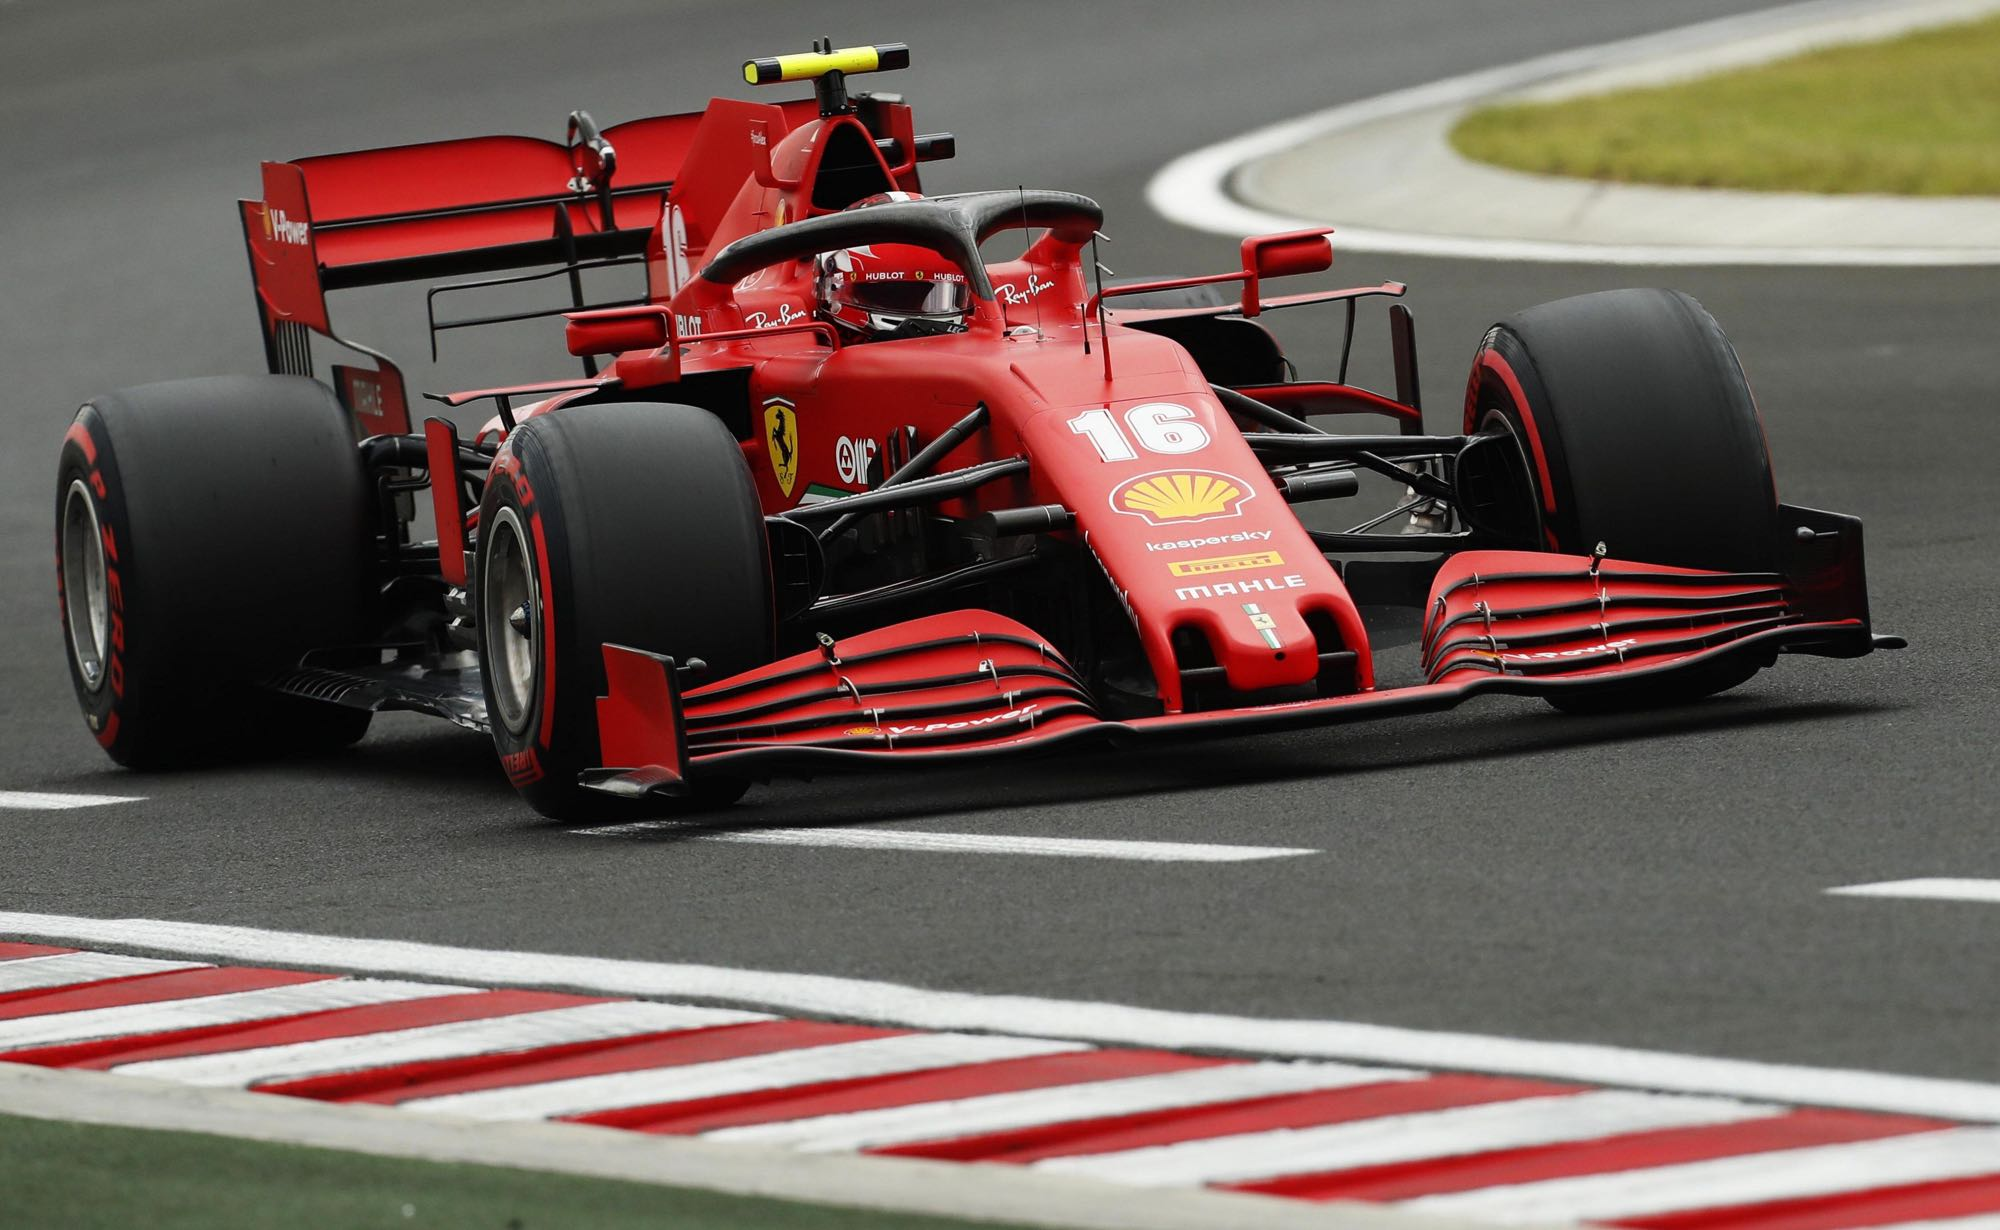 Ferrari F1 Formula 1 Red Cars Race Tracks Charles Leclerc Wallpaper Resolution 2000x1230 Id 1142980 Wallha Com